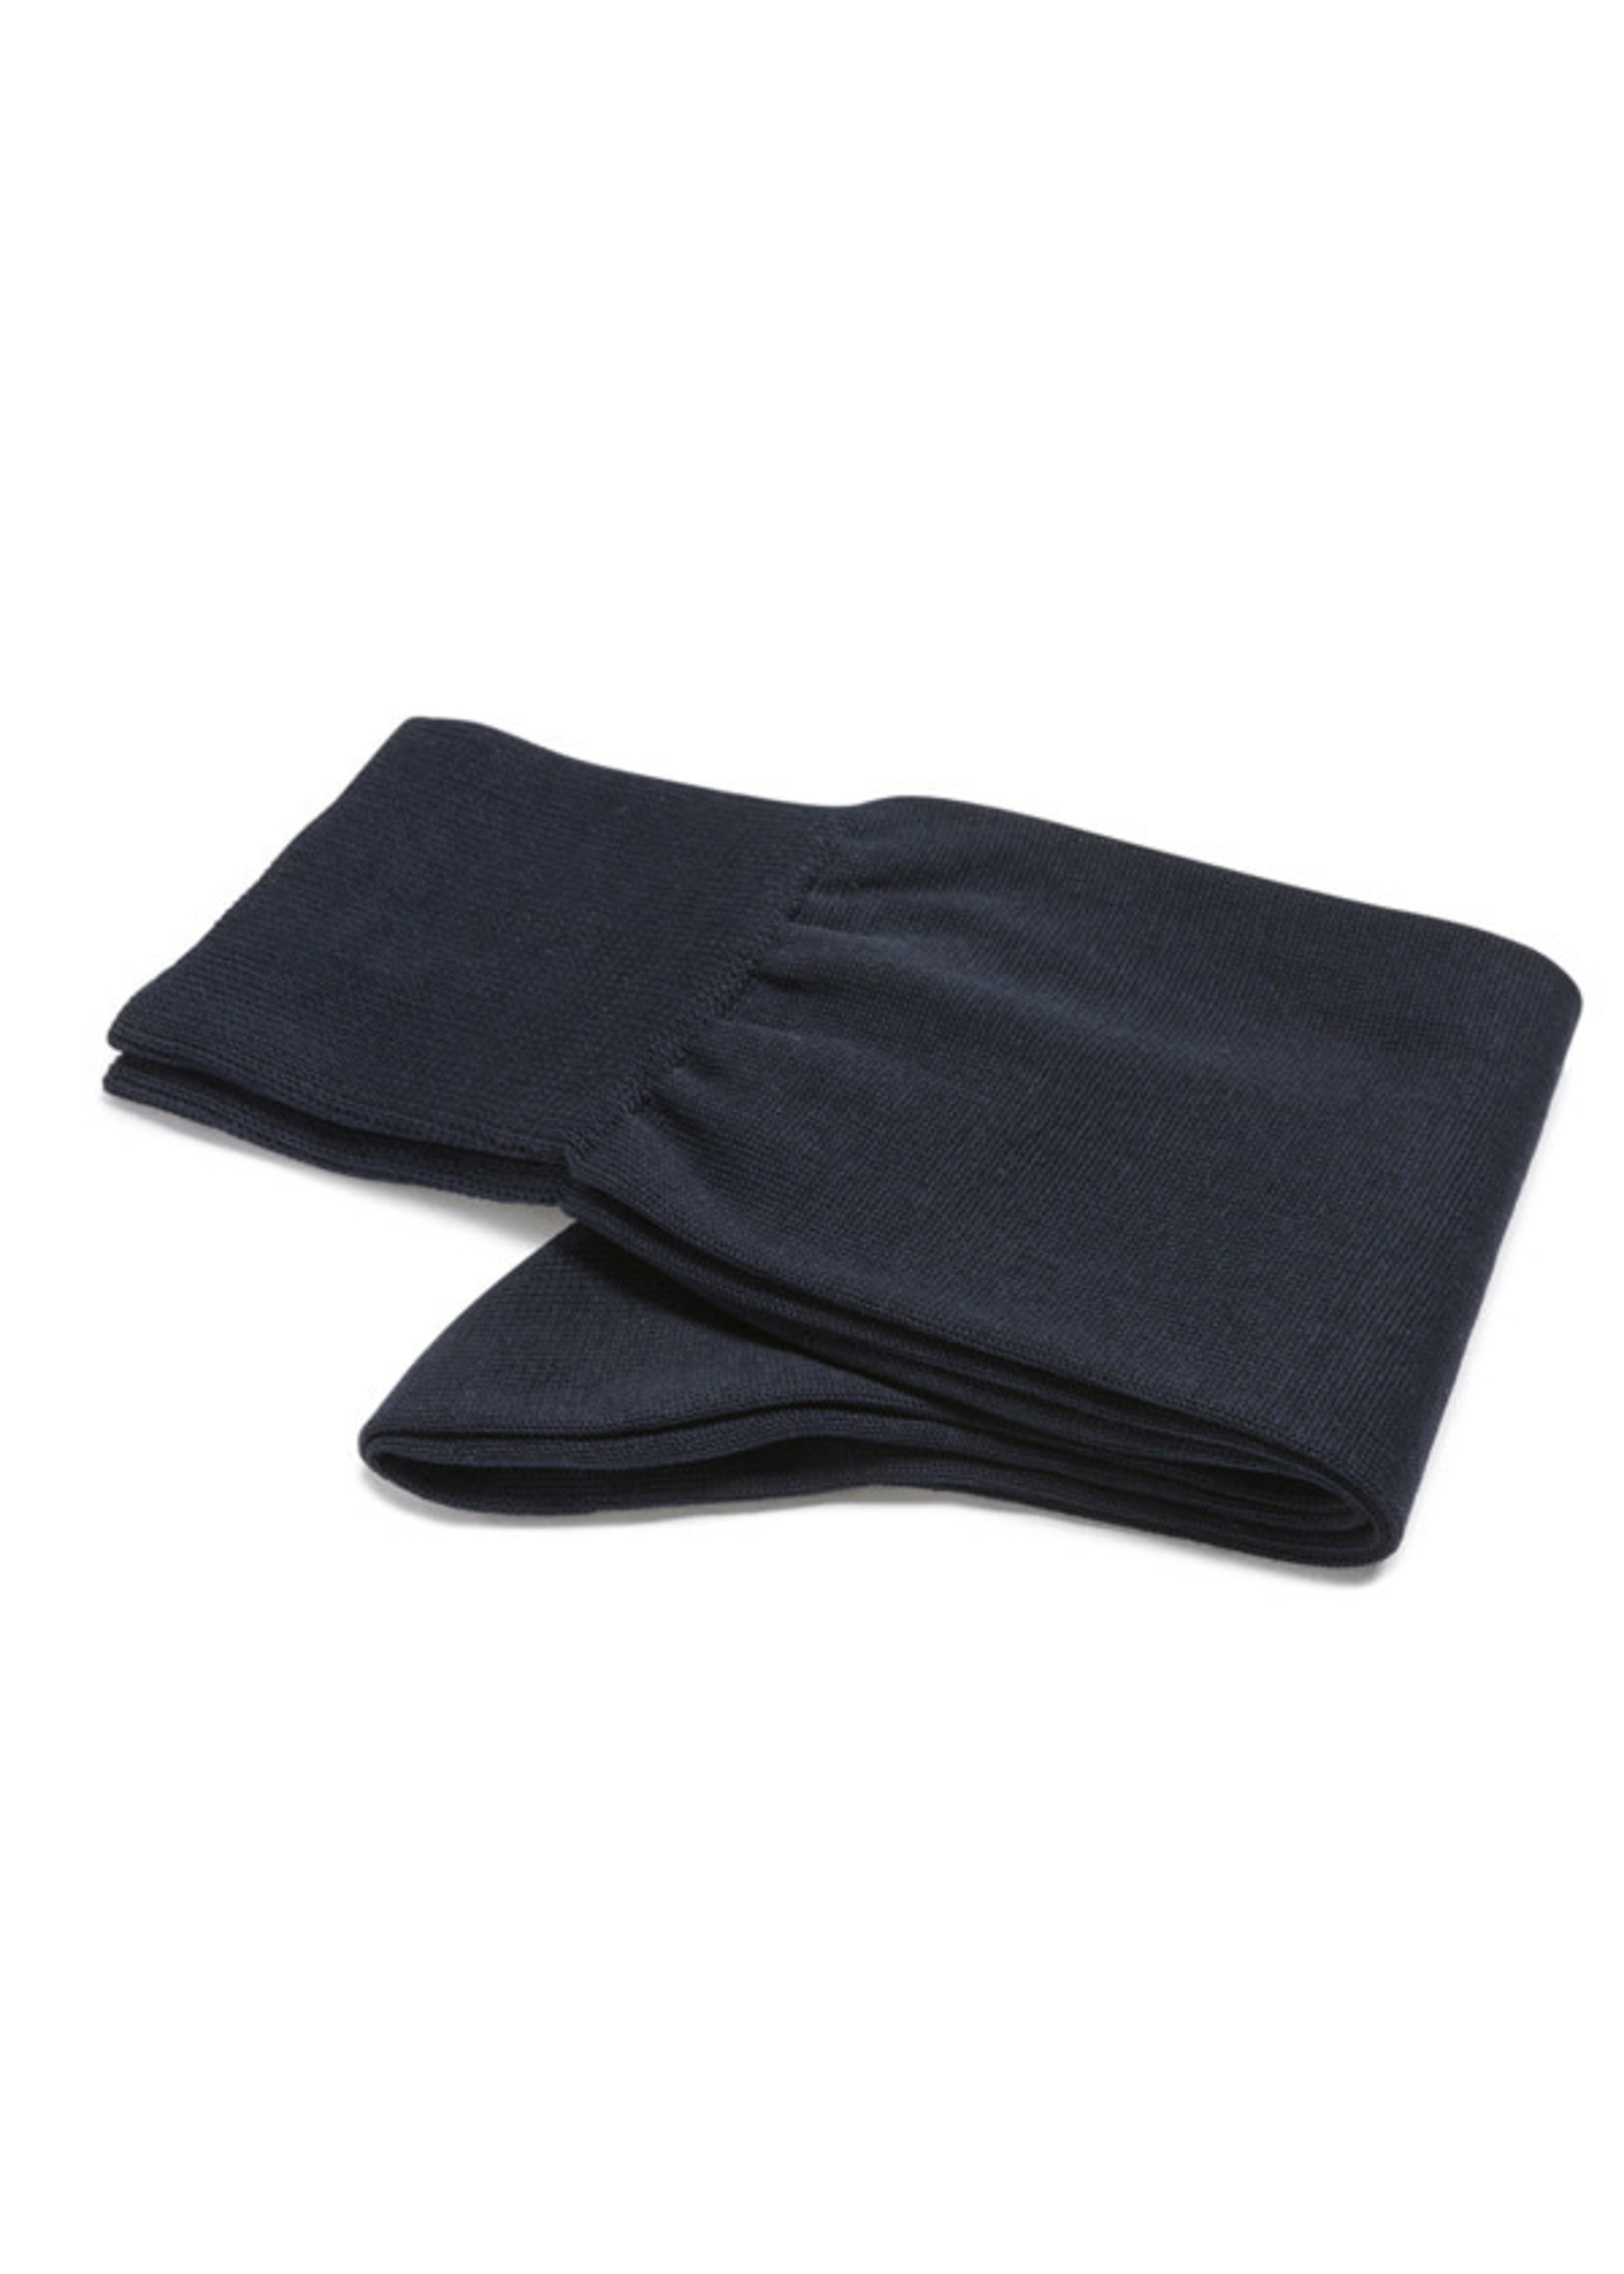 Carlo Lanza donkerblauwe katoenen sokken